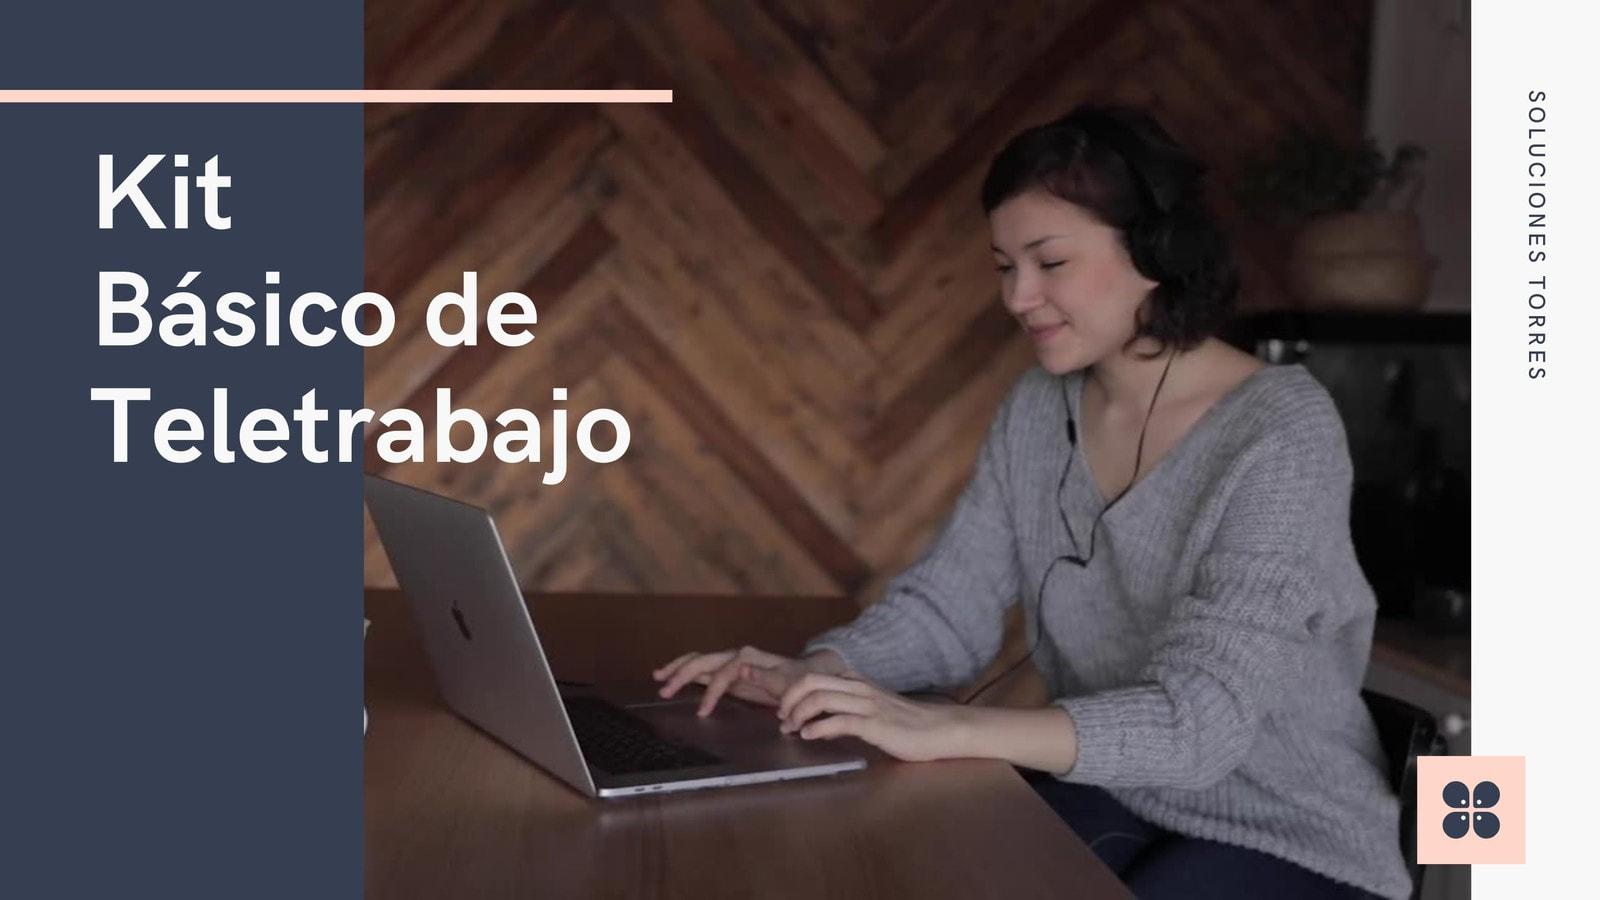 Azul Rosa Kit de Iniciación Empresas/Trabajo a Distancia Vídeo 16:9